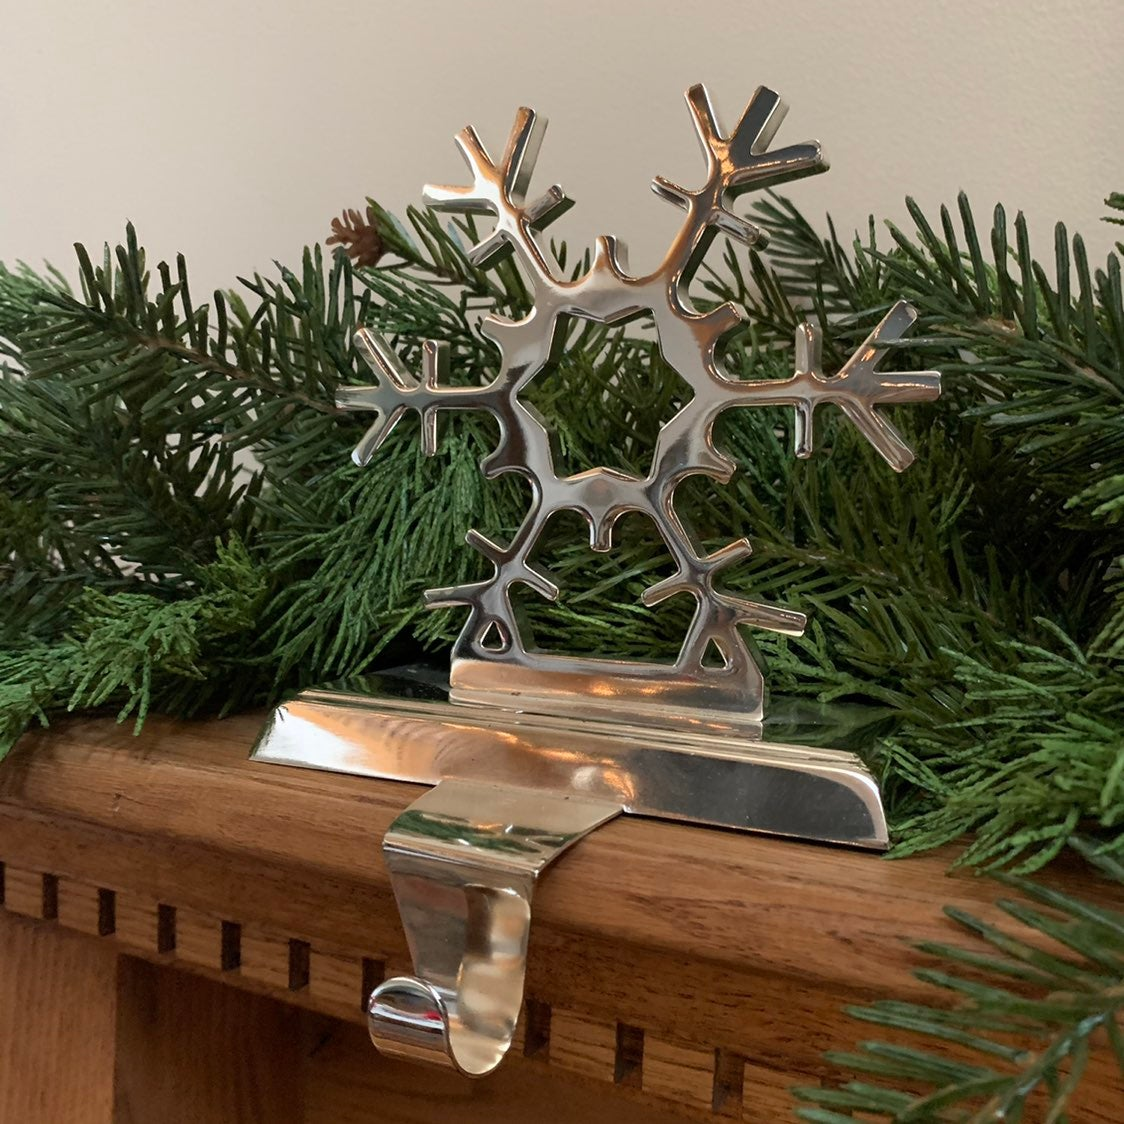 Pottery Barn Snowflake Stocking Hanger